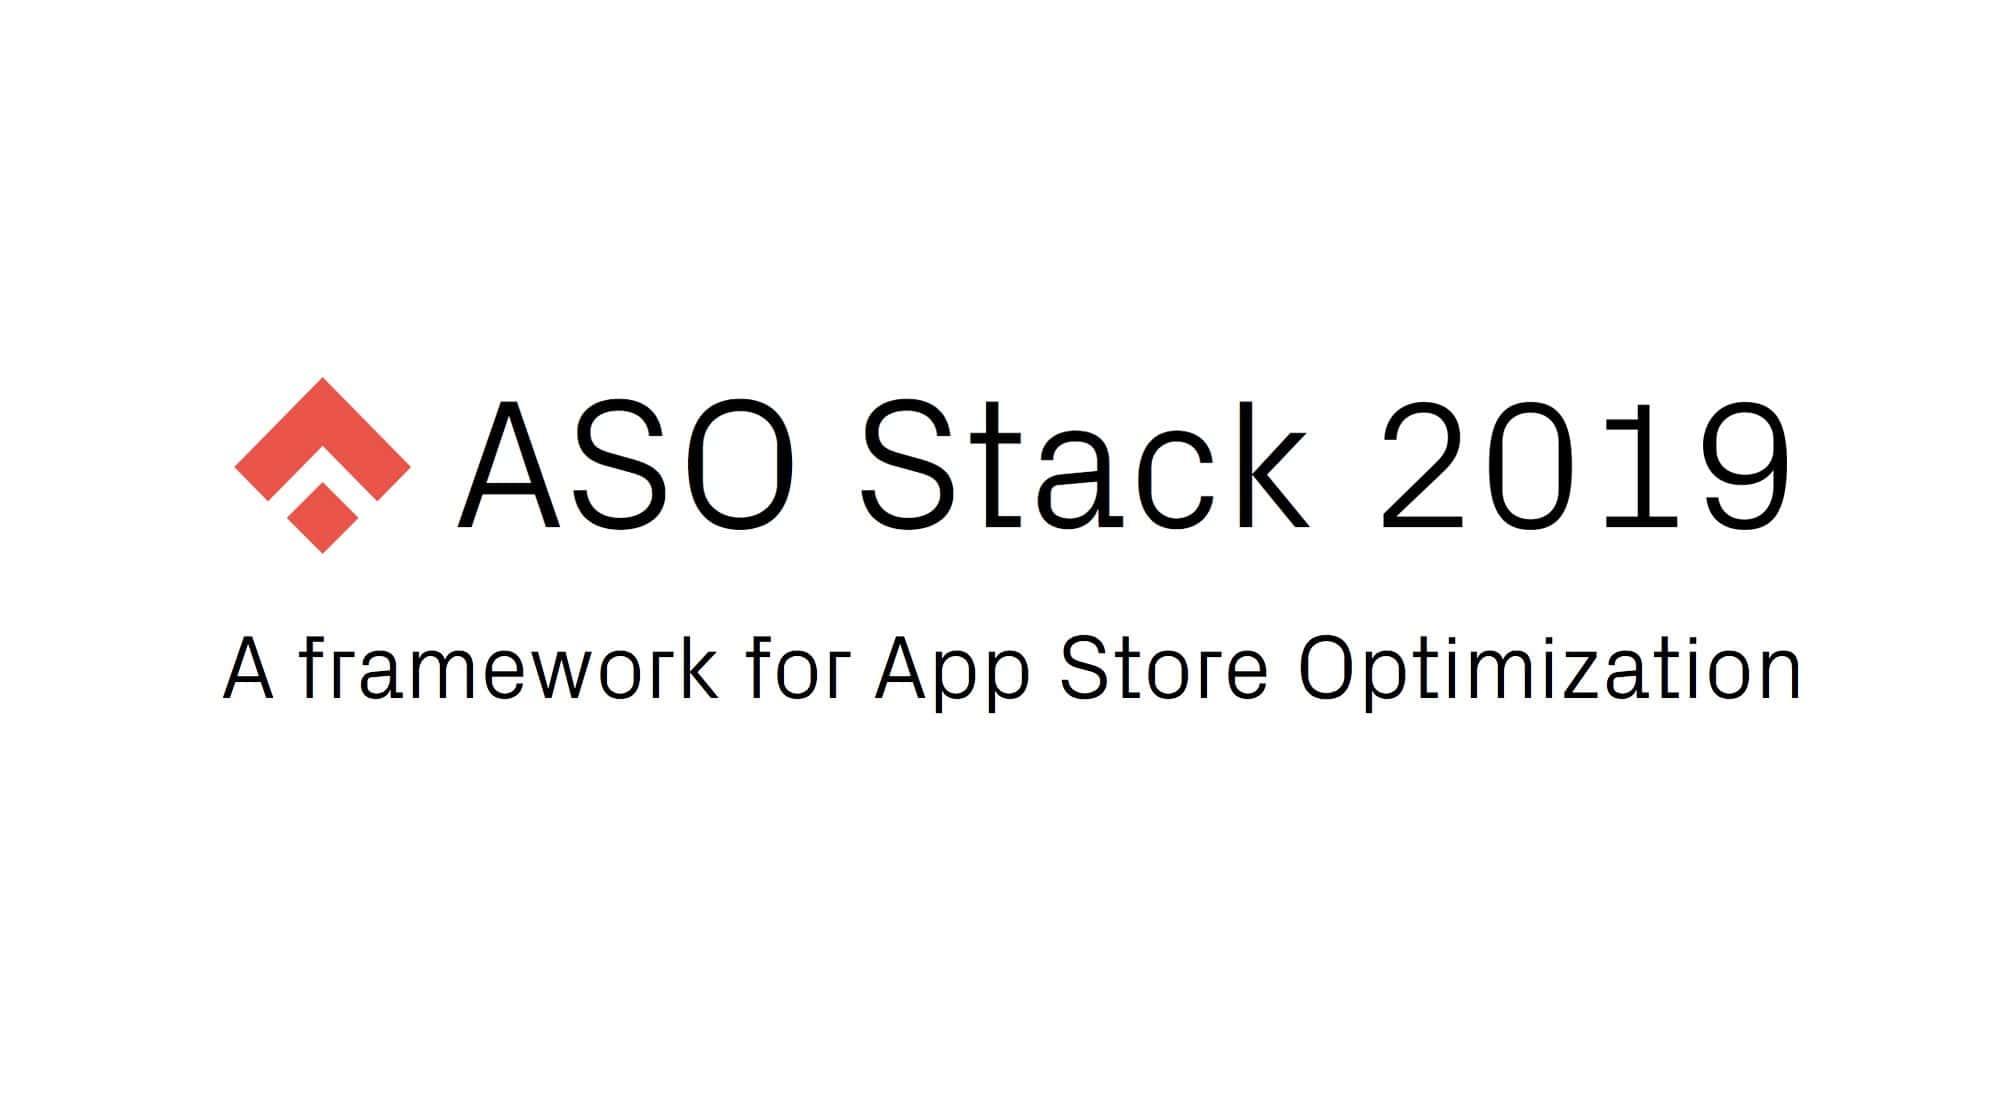 aso stack 2019